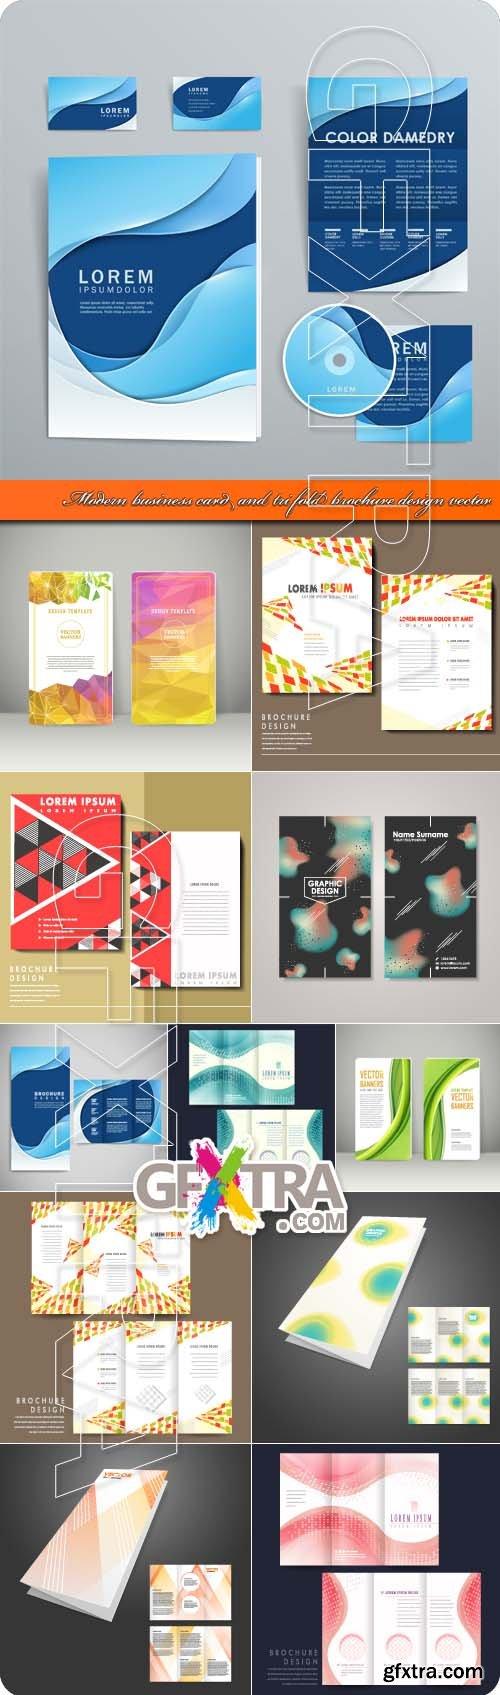 Modern business card and tri fold brochure design vector